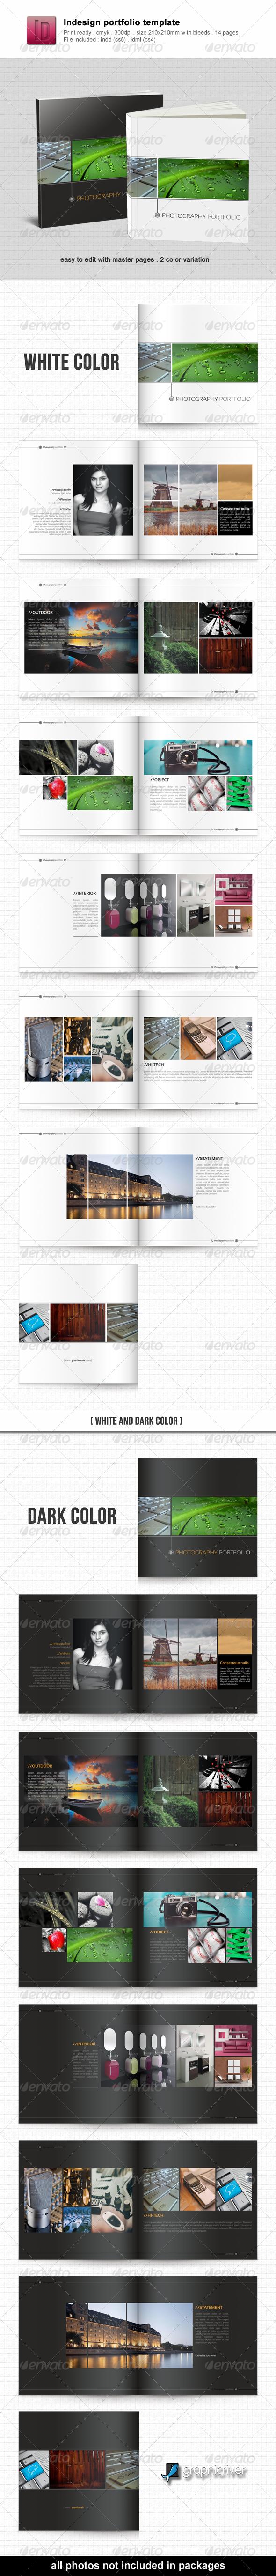 Indesign Portfolio Template by kartodarim | GraphicRiver